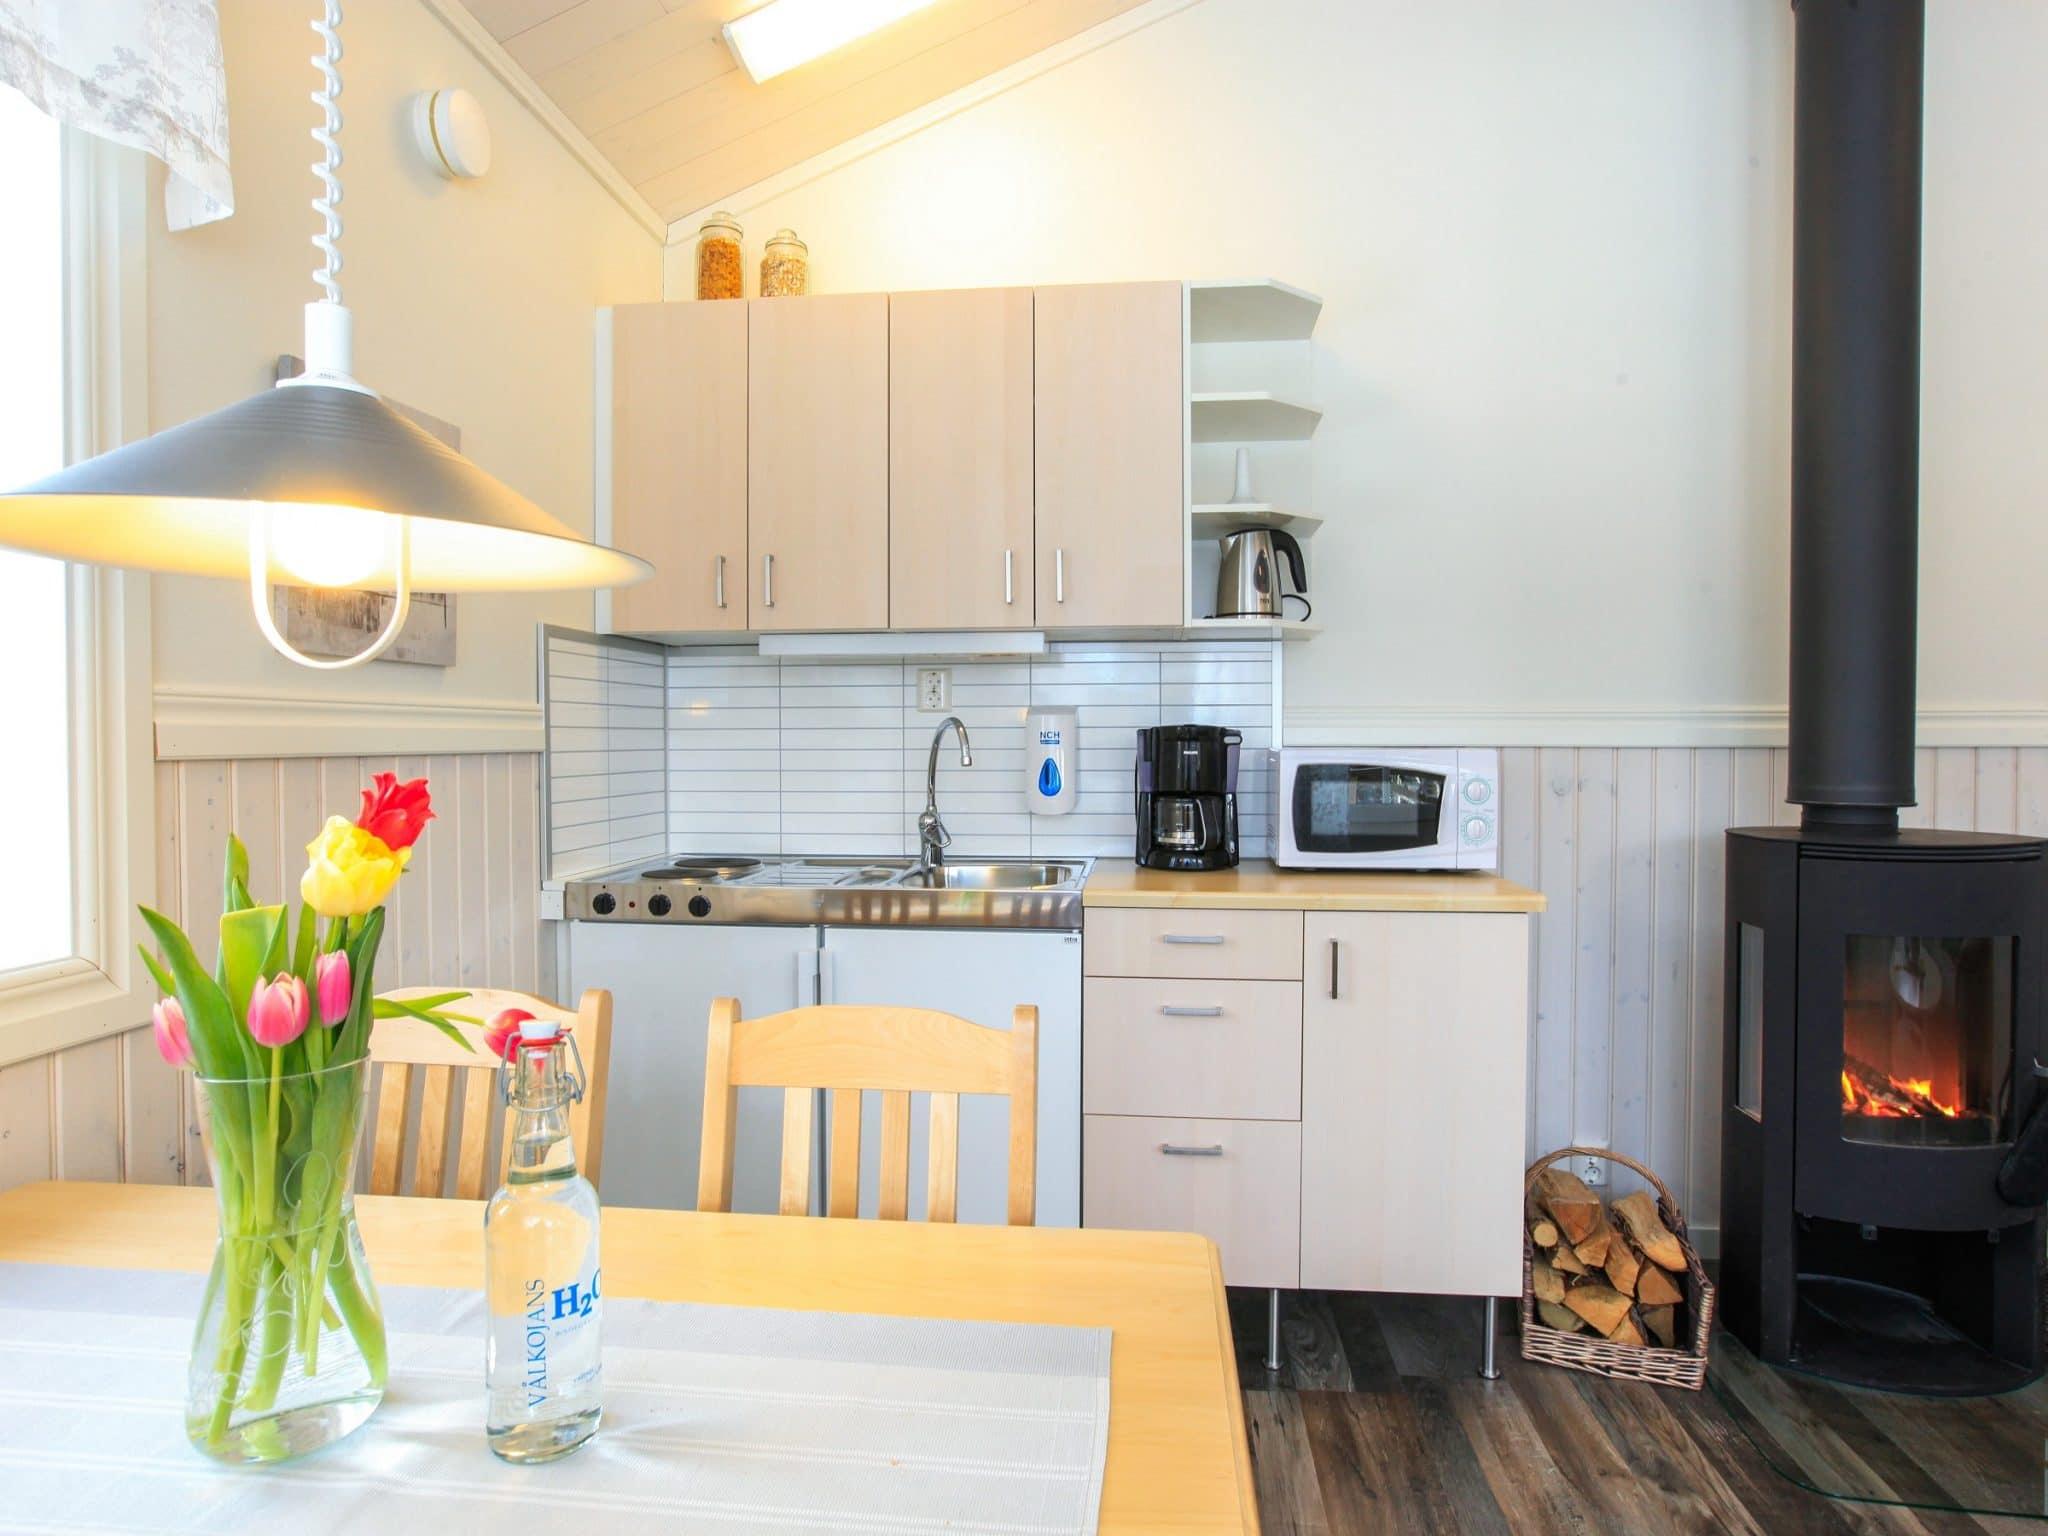 Kitchen, kitchen table stove in Vålkojan, Vemdalen